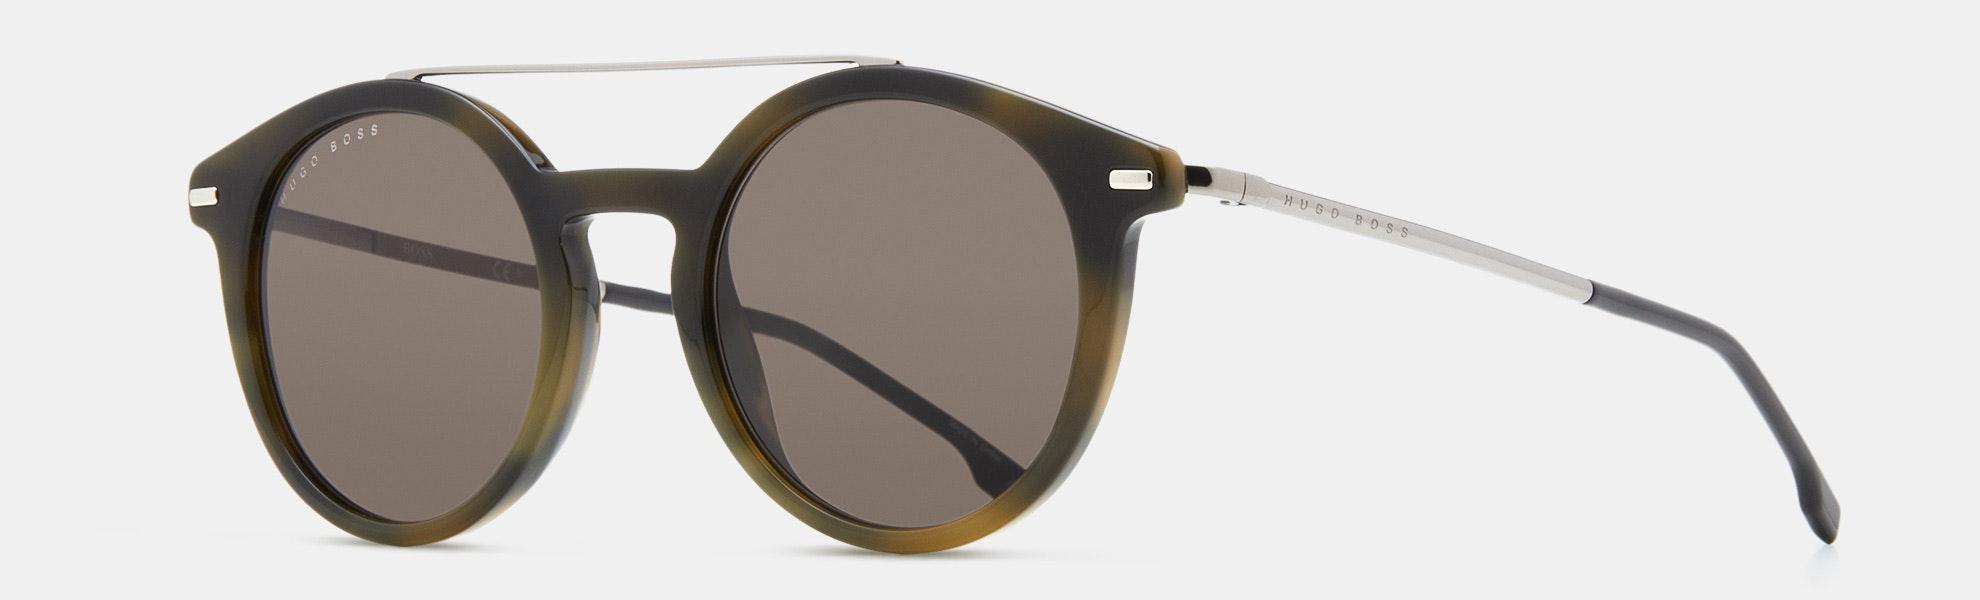 Hugo Boss 0929S Sunglasses